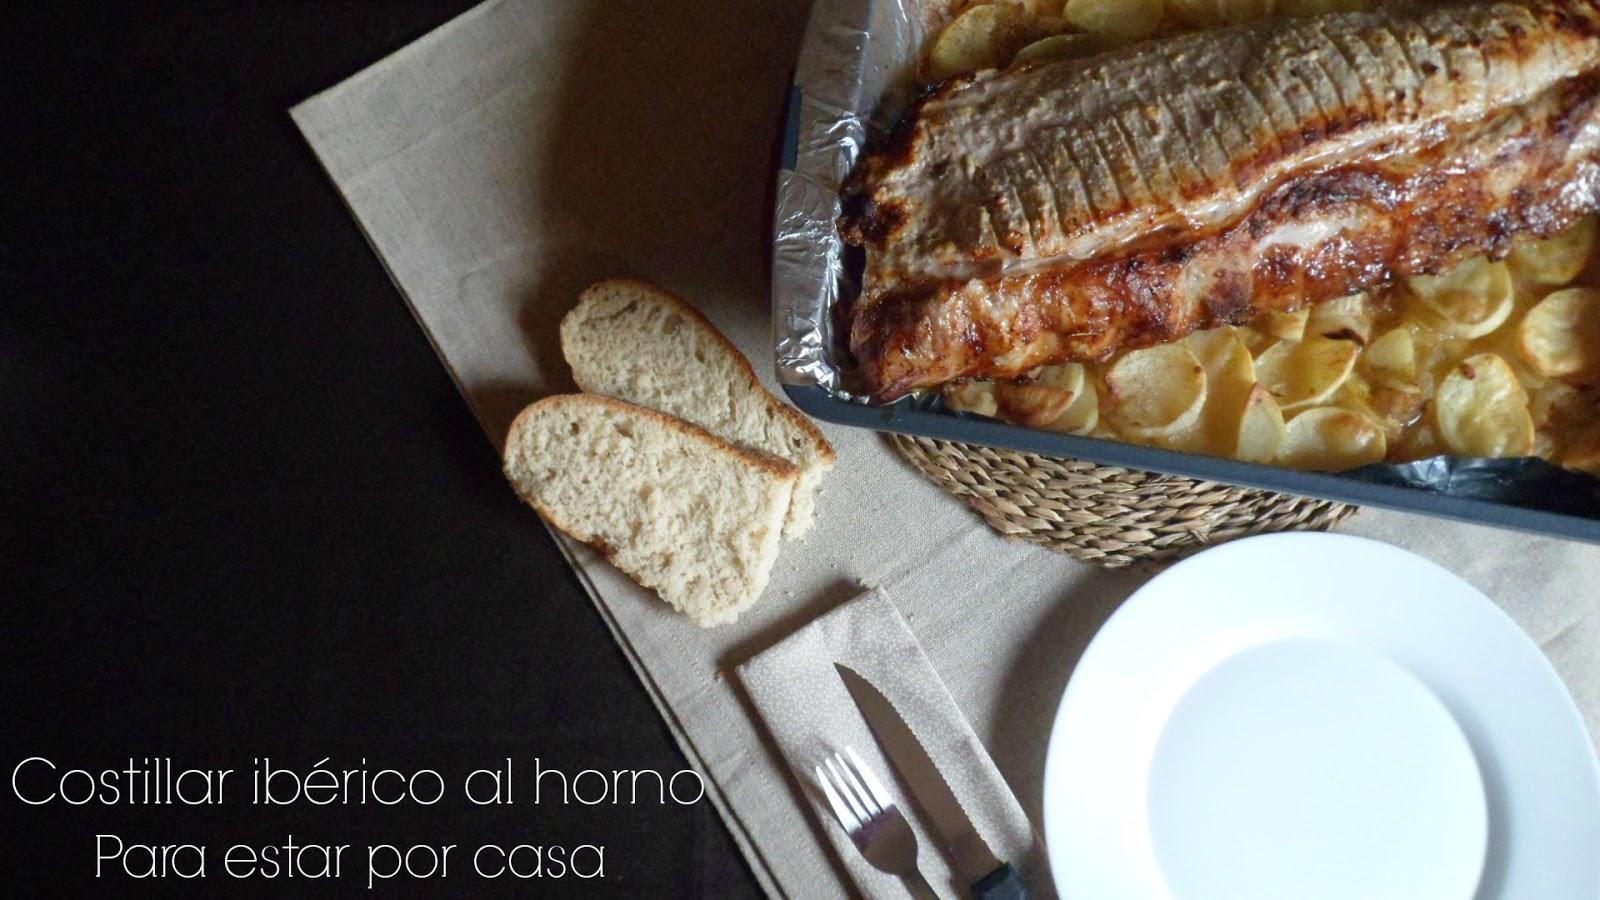 Costillar de cerdo ib rico al horno Solomillo iberico al horno